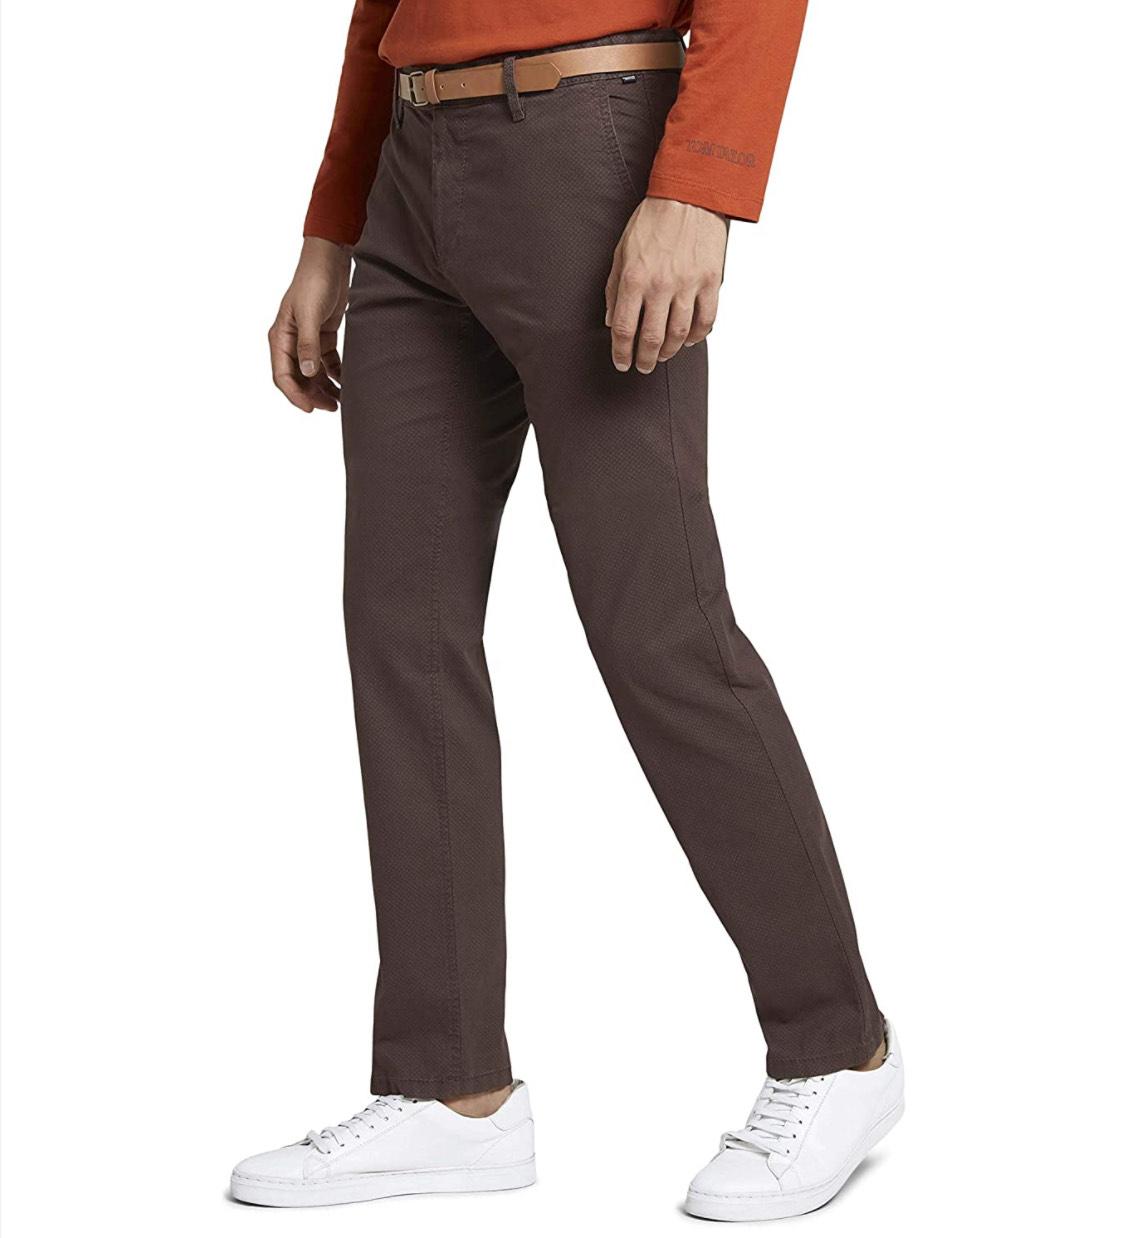 Pantalón tipo chino Tom Tailor talla 31W/32L (40 largo normal)